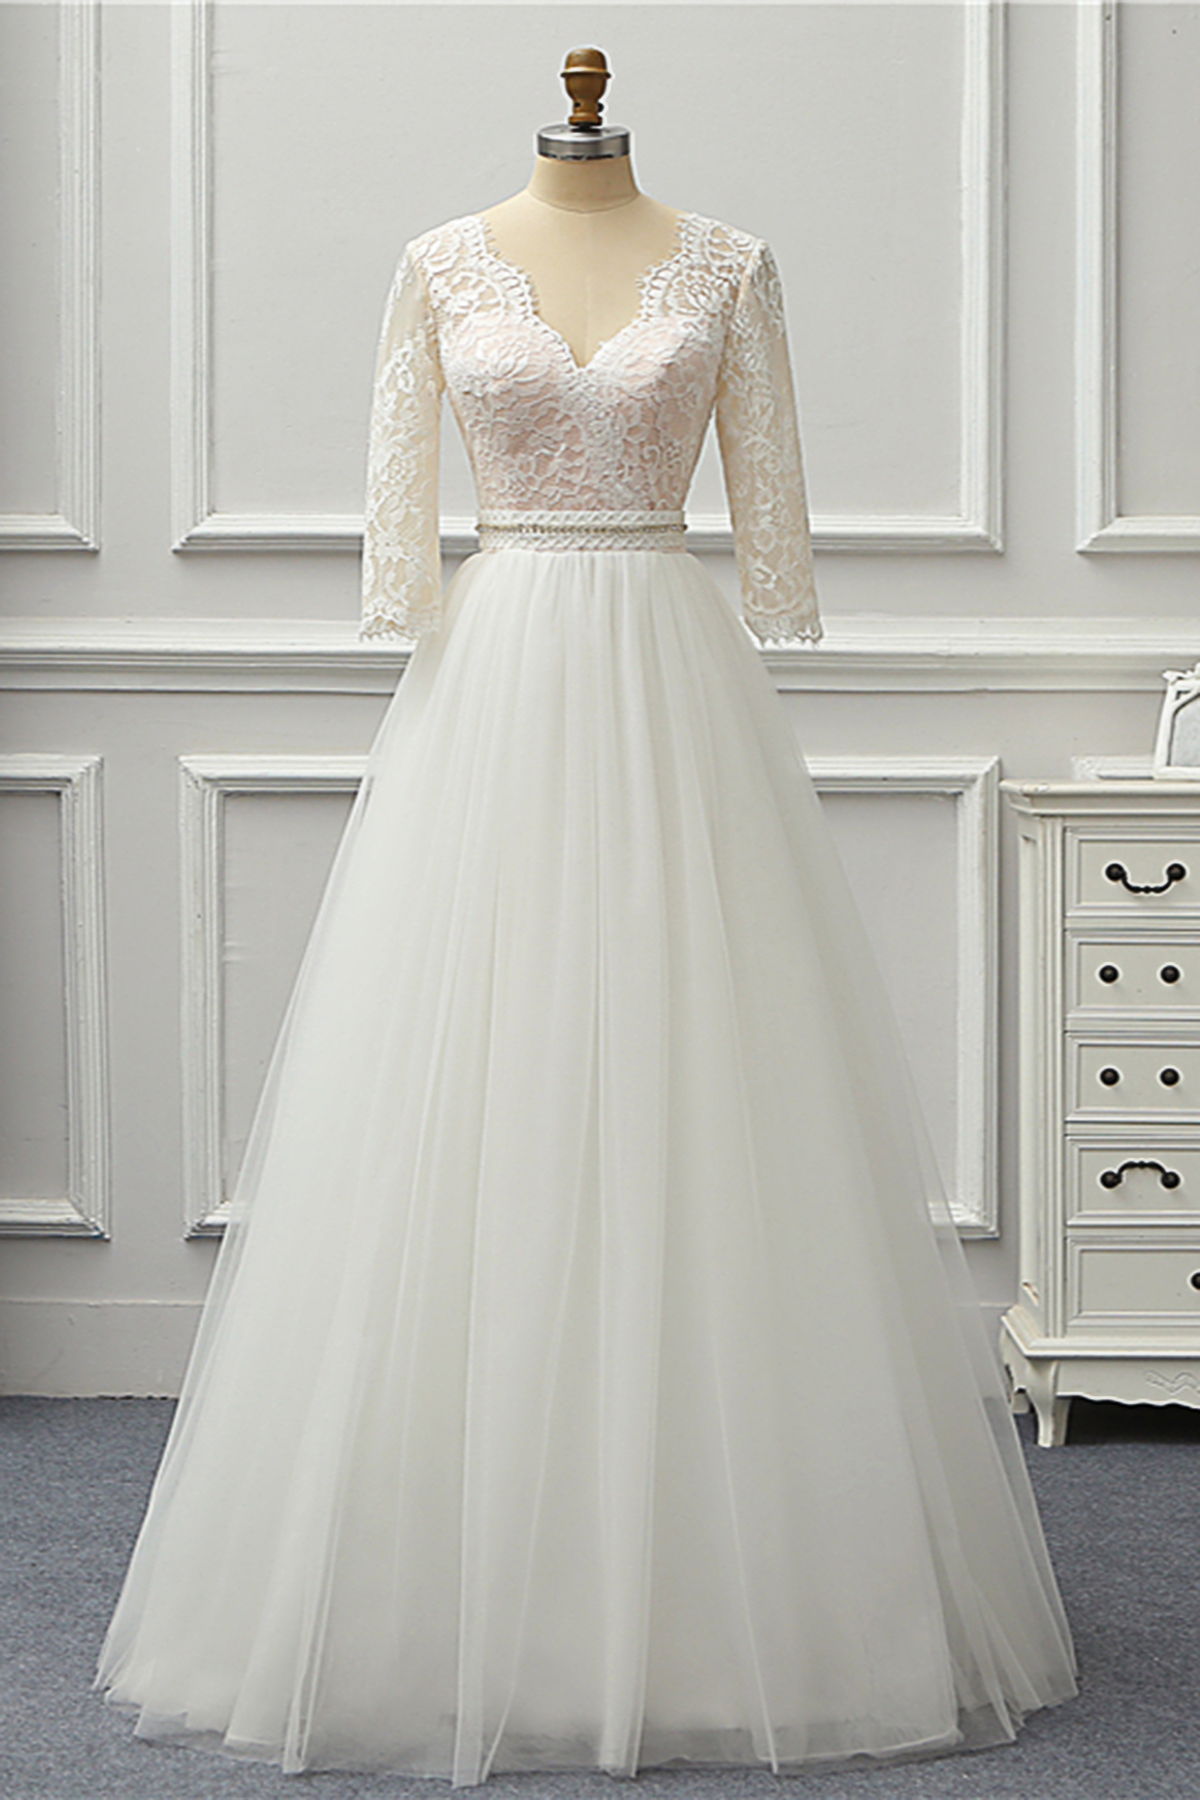 6084516033 New Design White Lace Pearl 3/4 Sleeve Beach Wedding Dress, Formal Prom  Dress